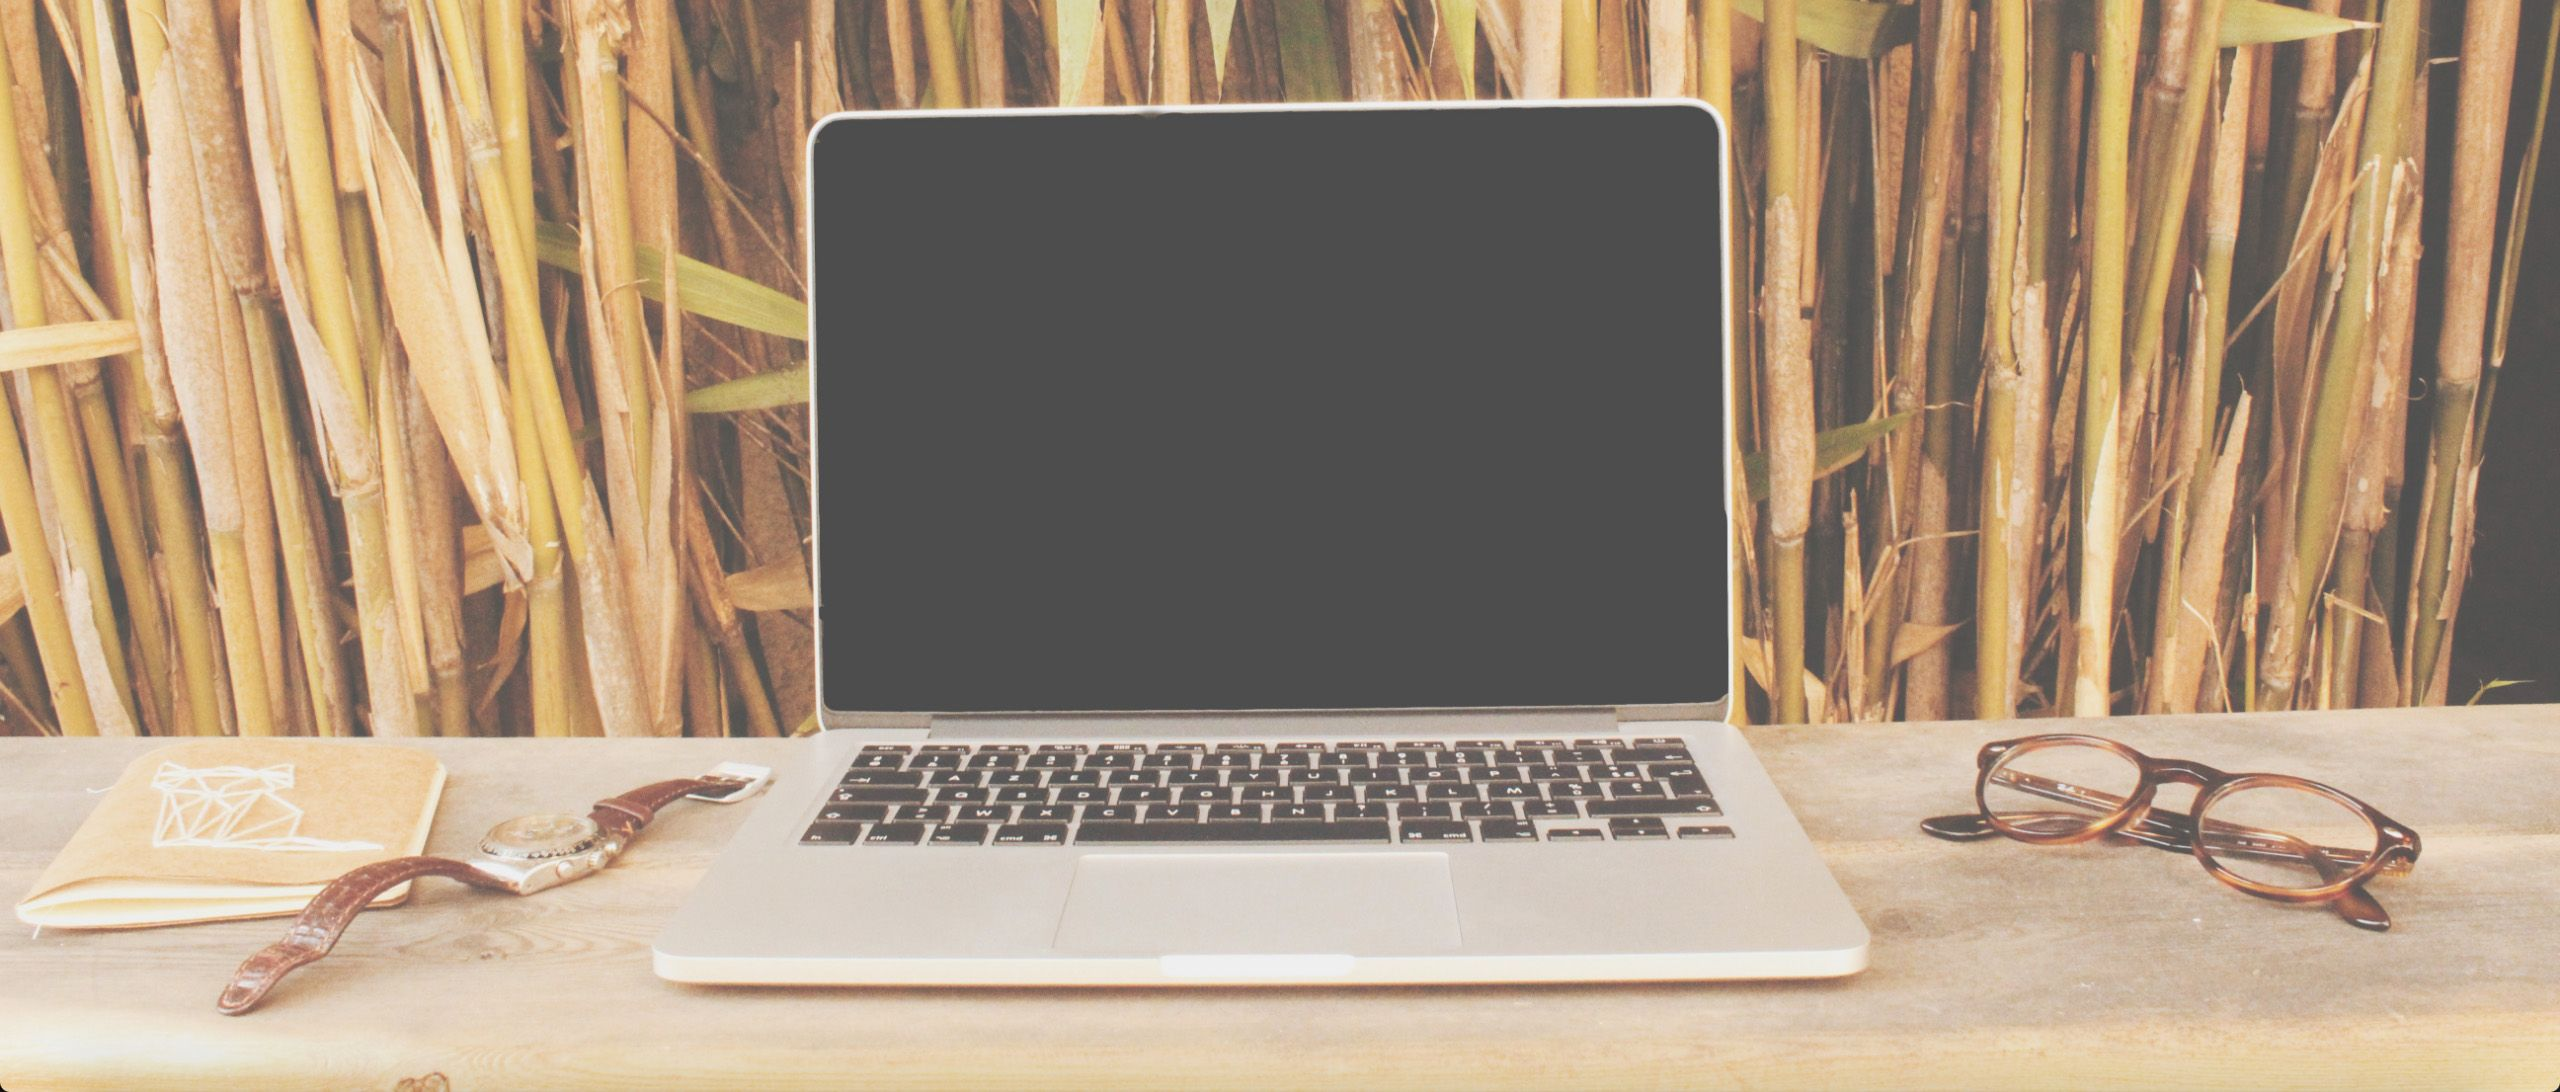 belajar internet marketing online gratis